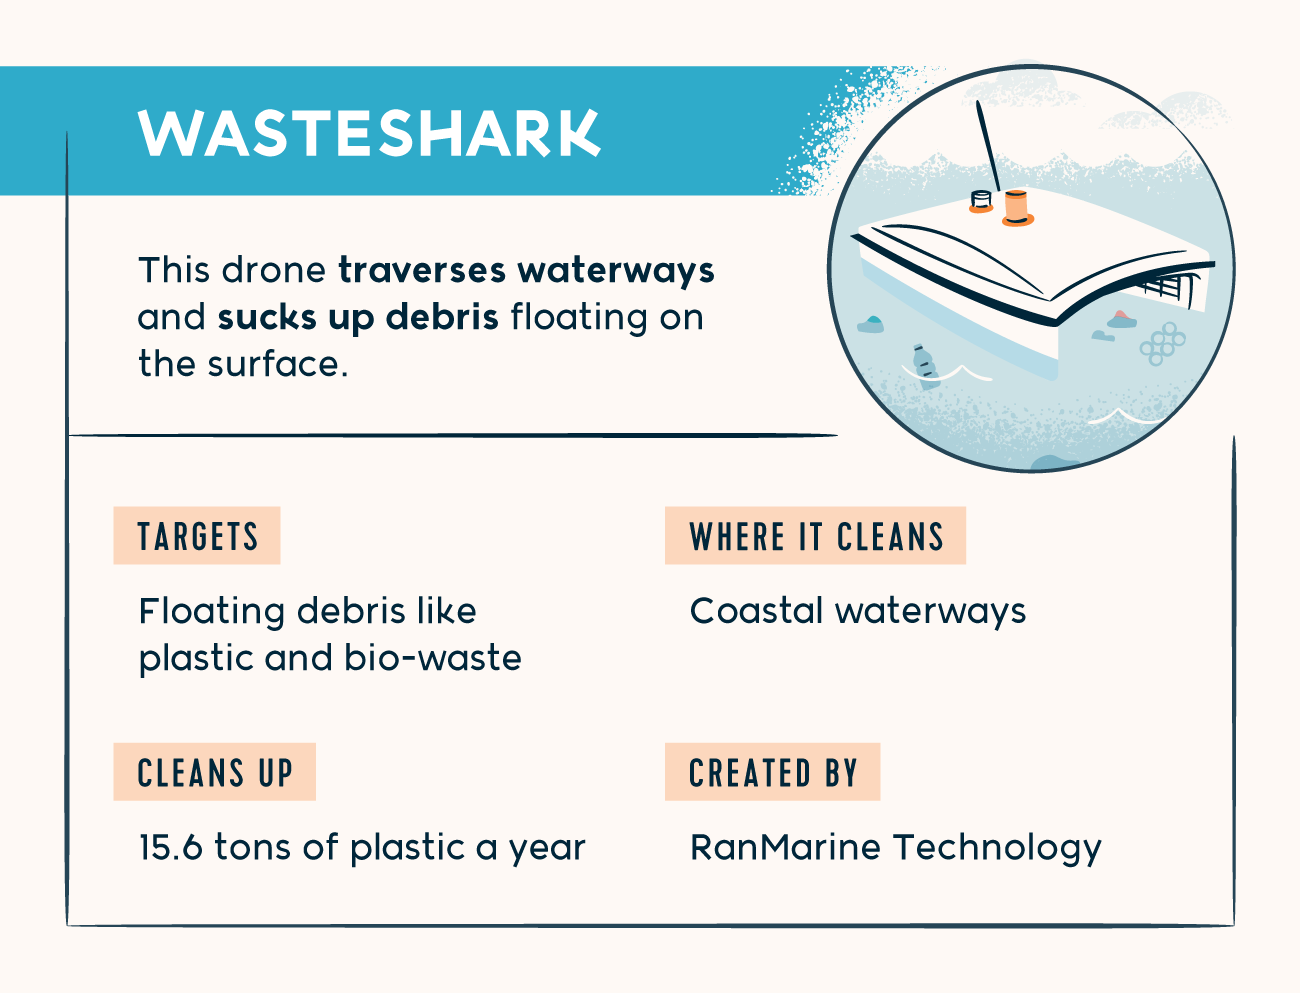 wasteshark